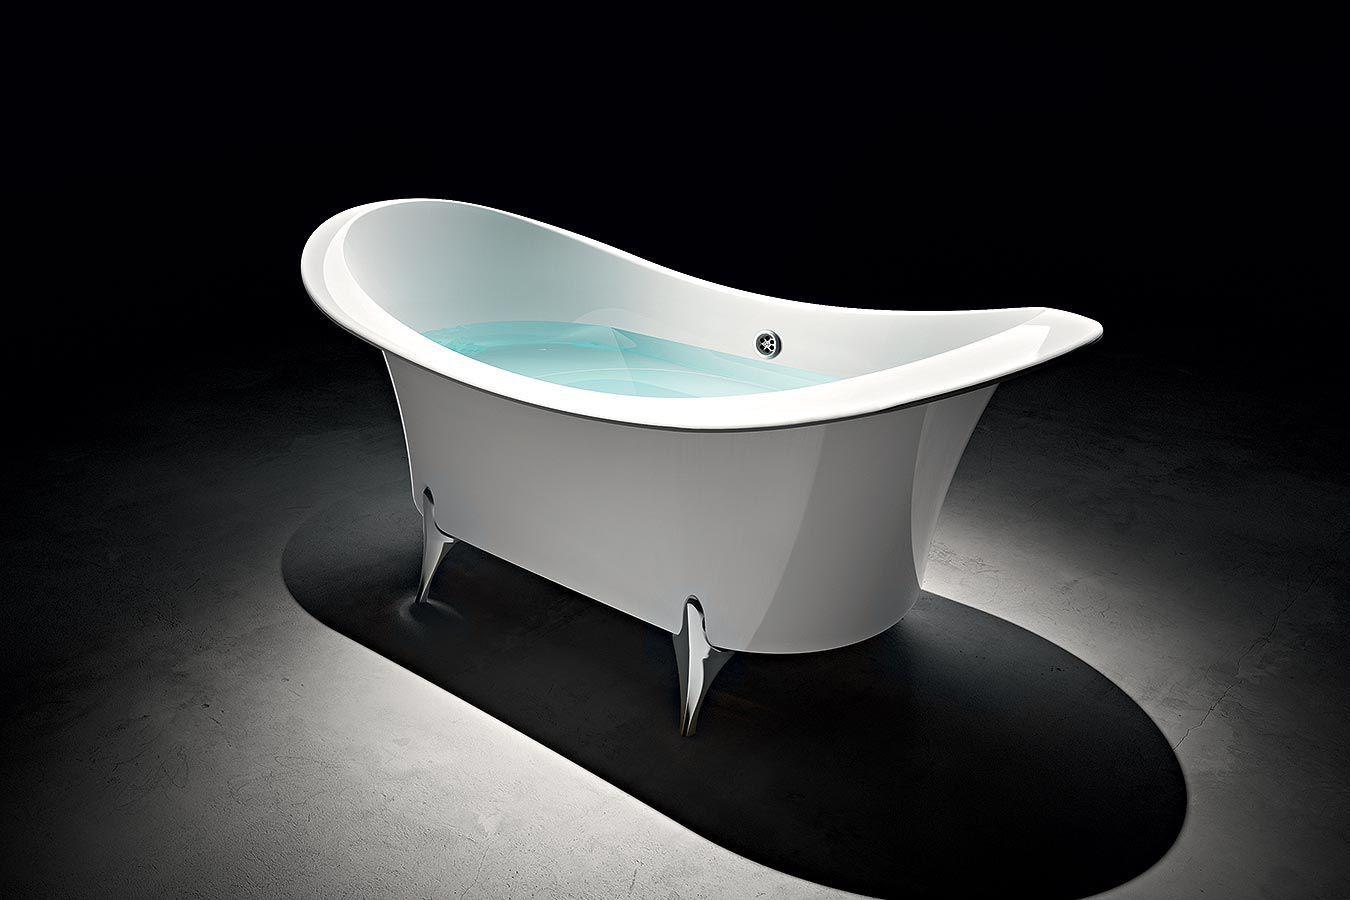 Vasche Da Bagno Angolari Treesse : Vasca da bagno treesse quadra mts mts casaomnia